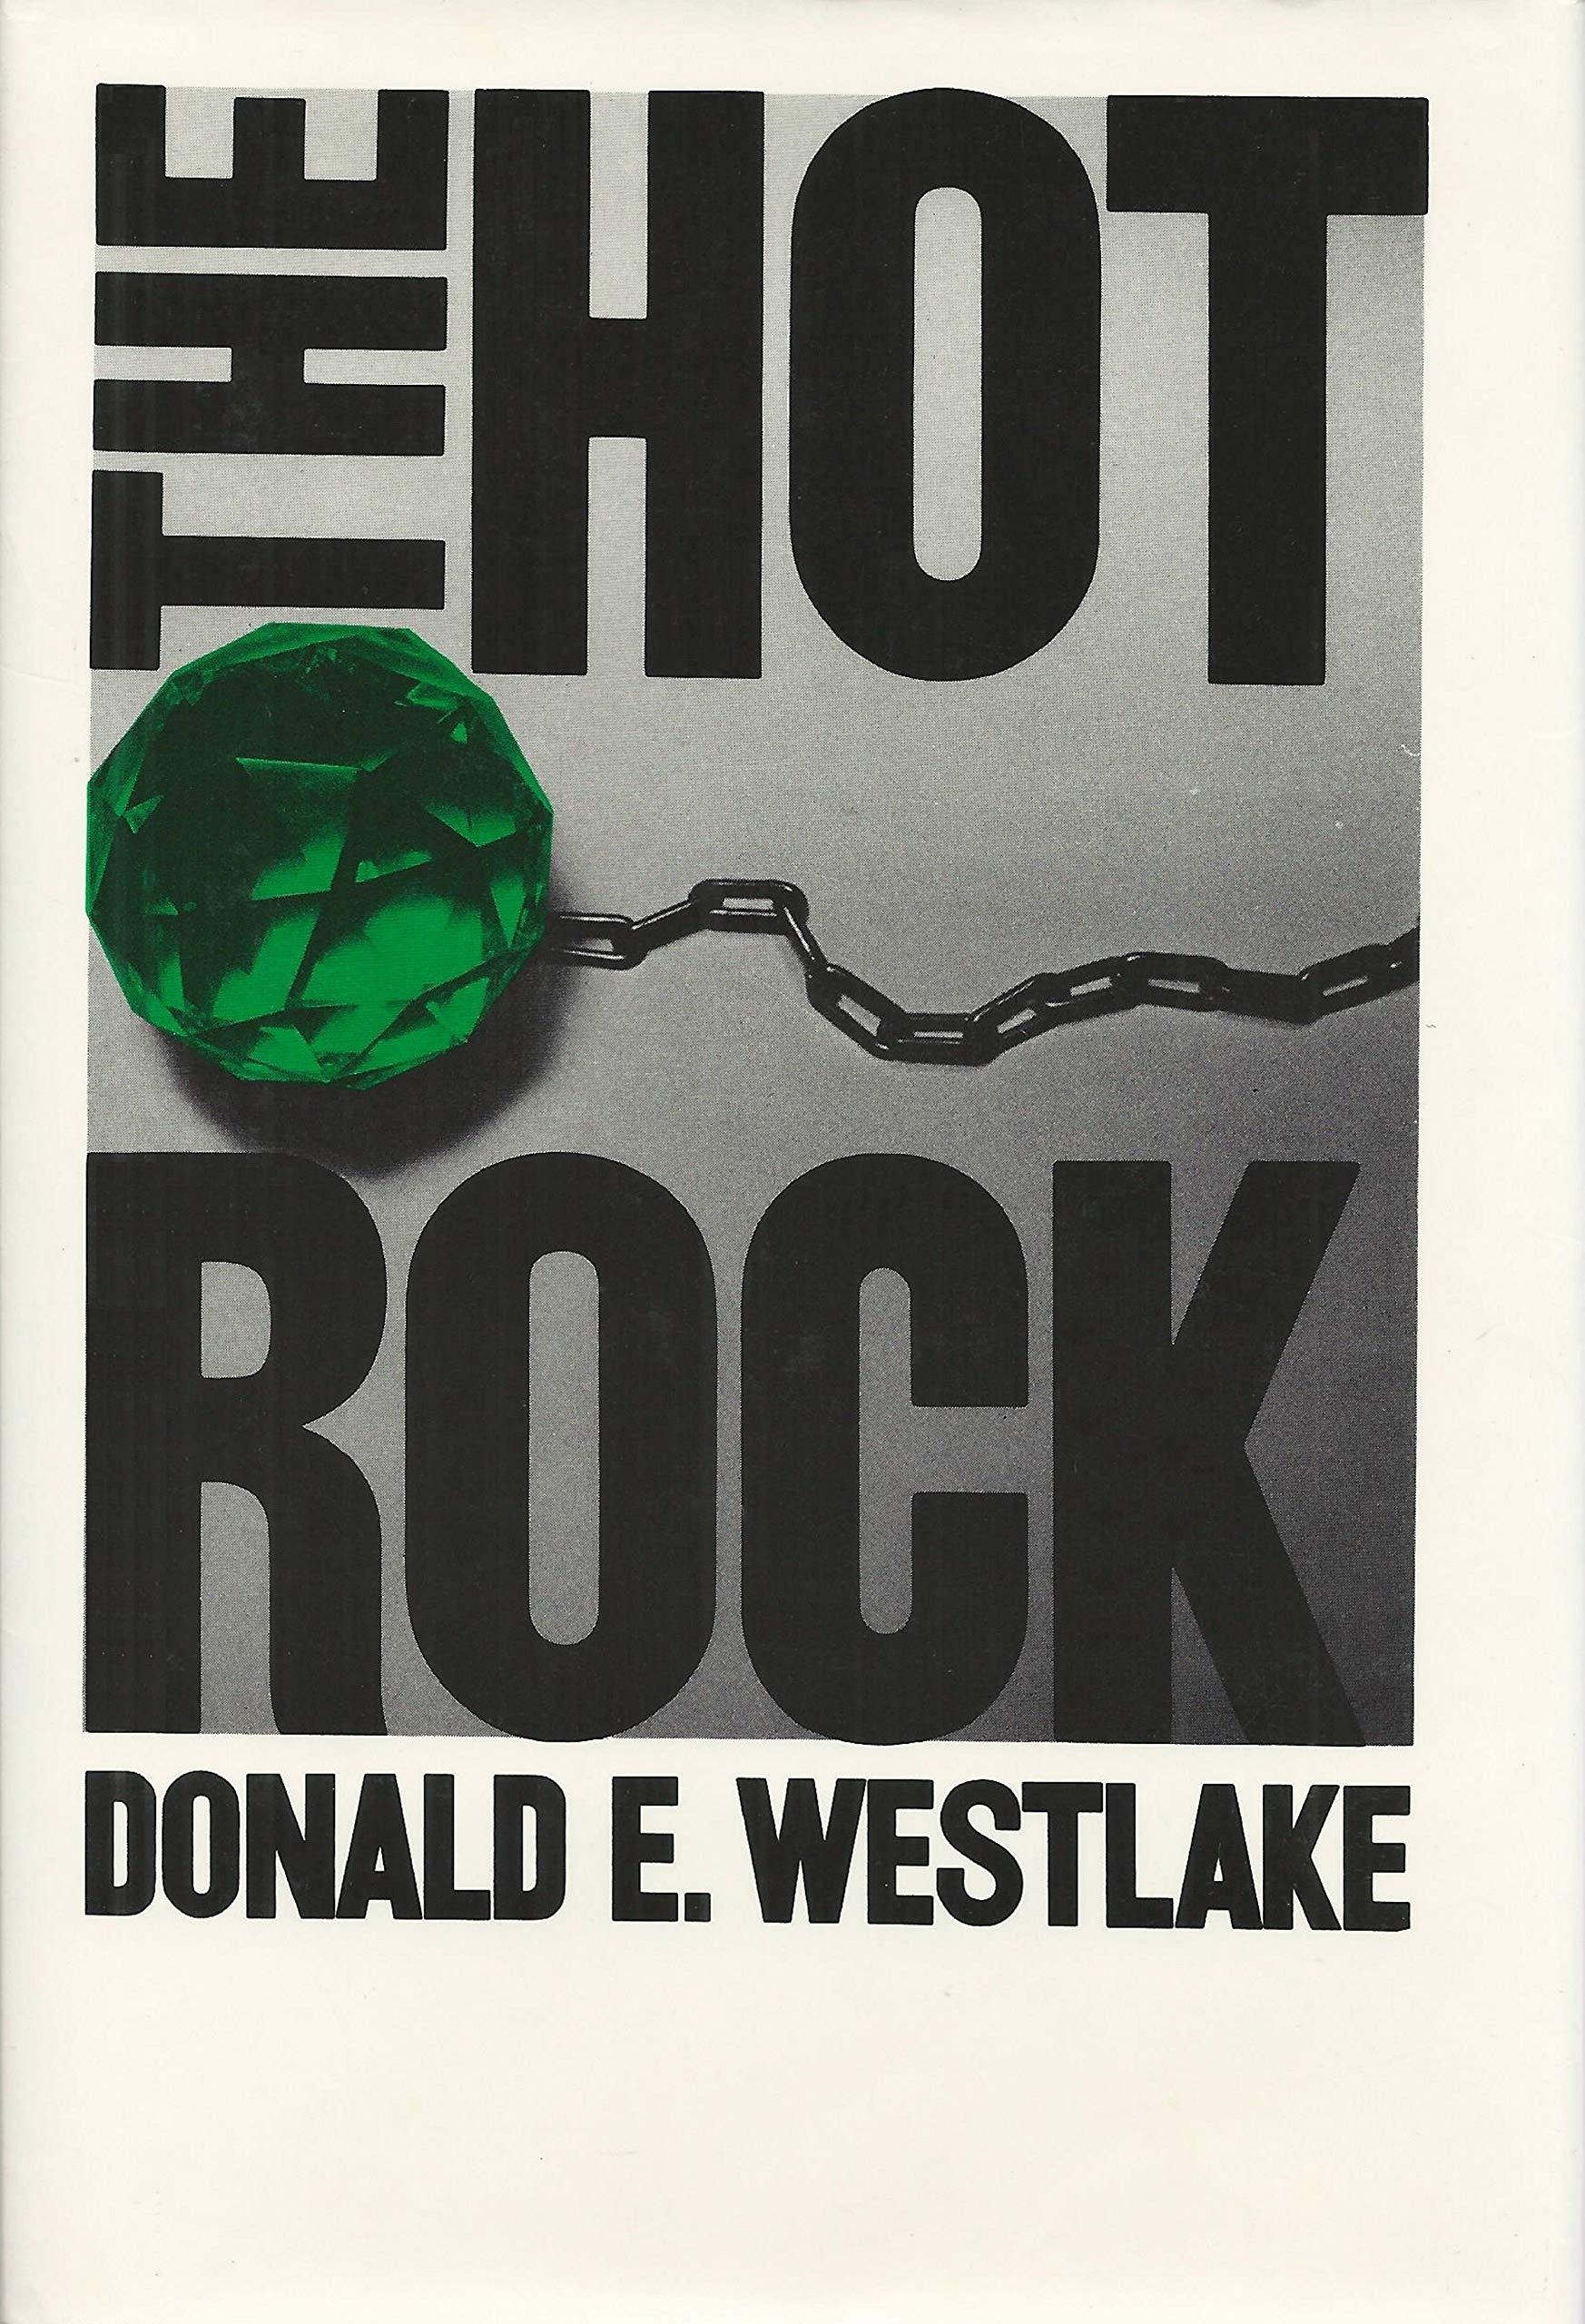 Дональд Уэстлейк — Проклятый изумруд (1970)